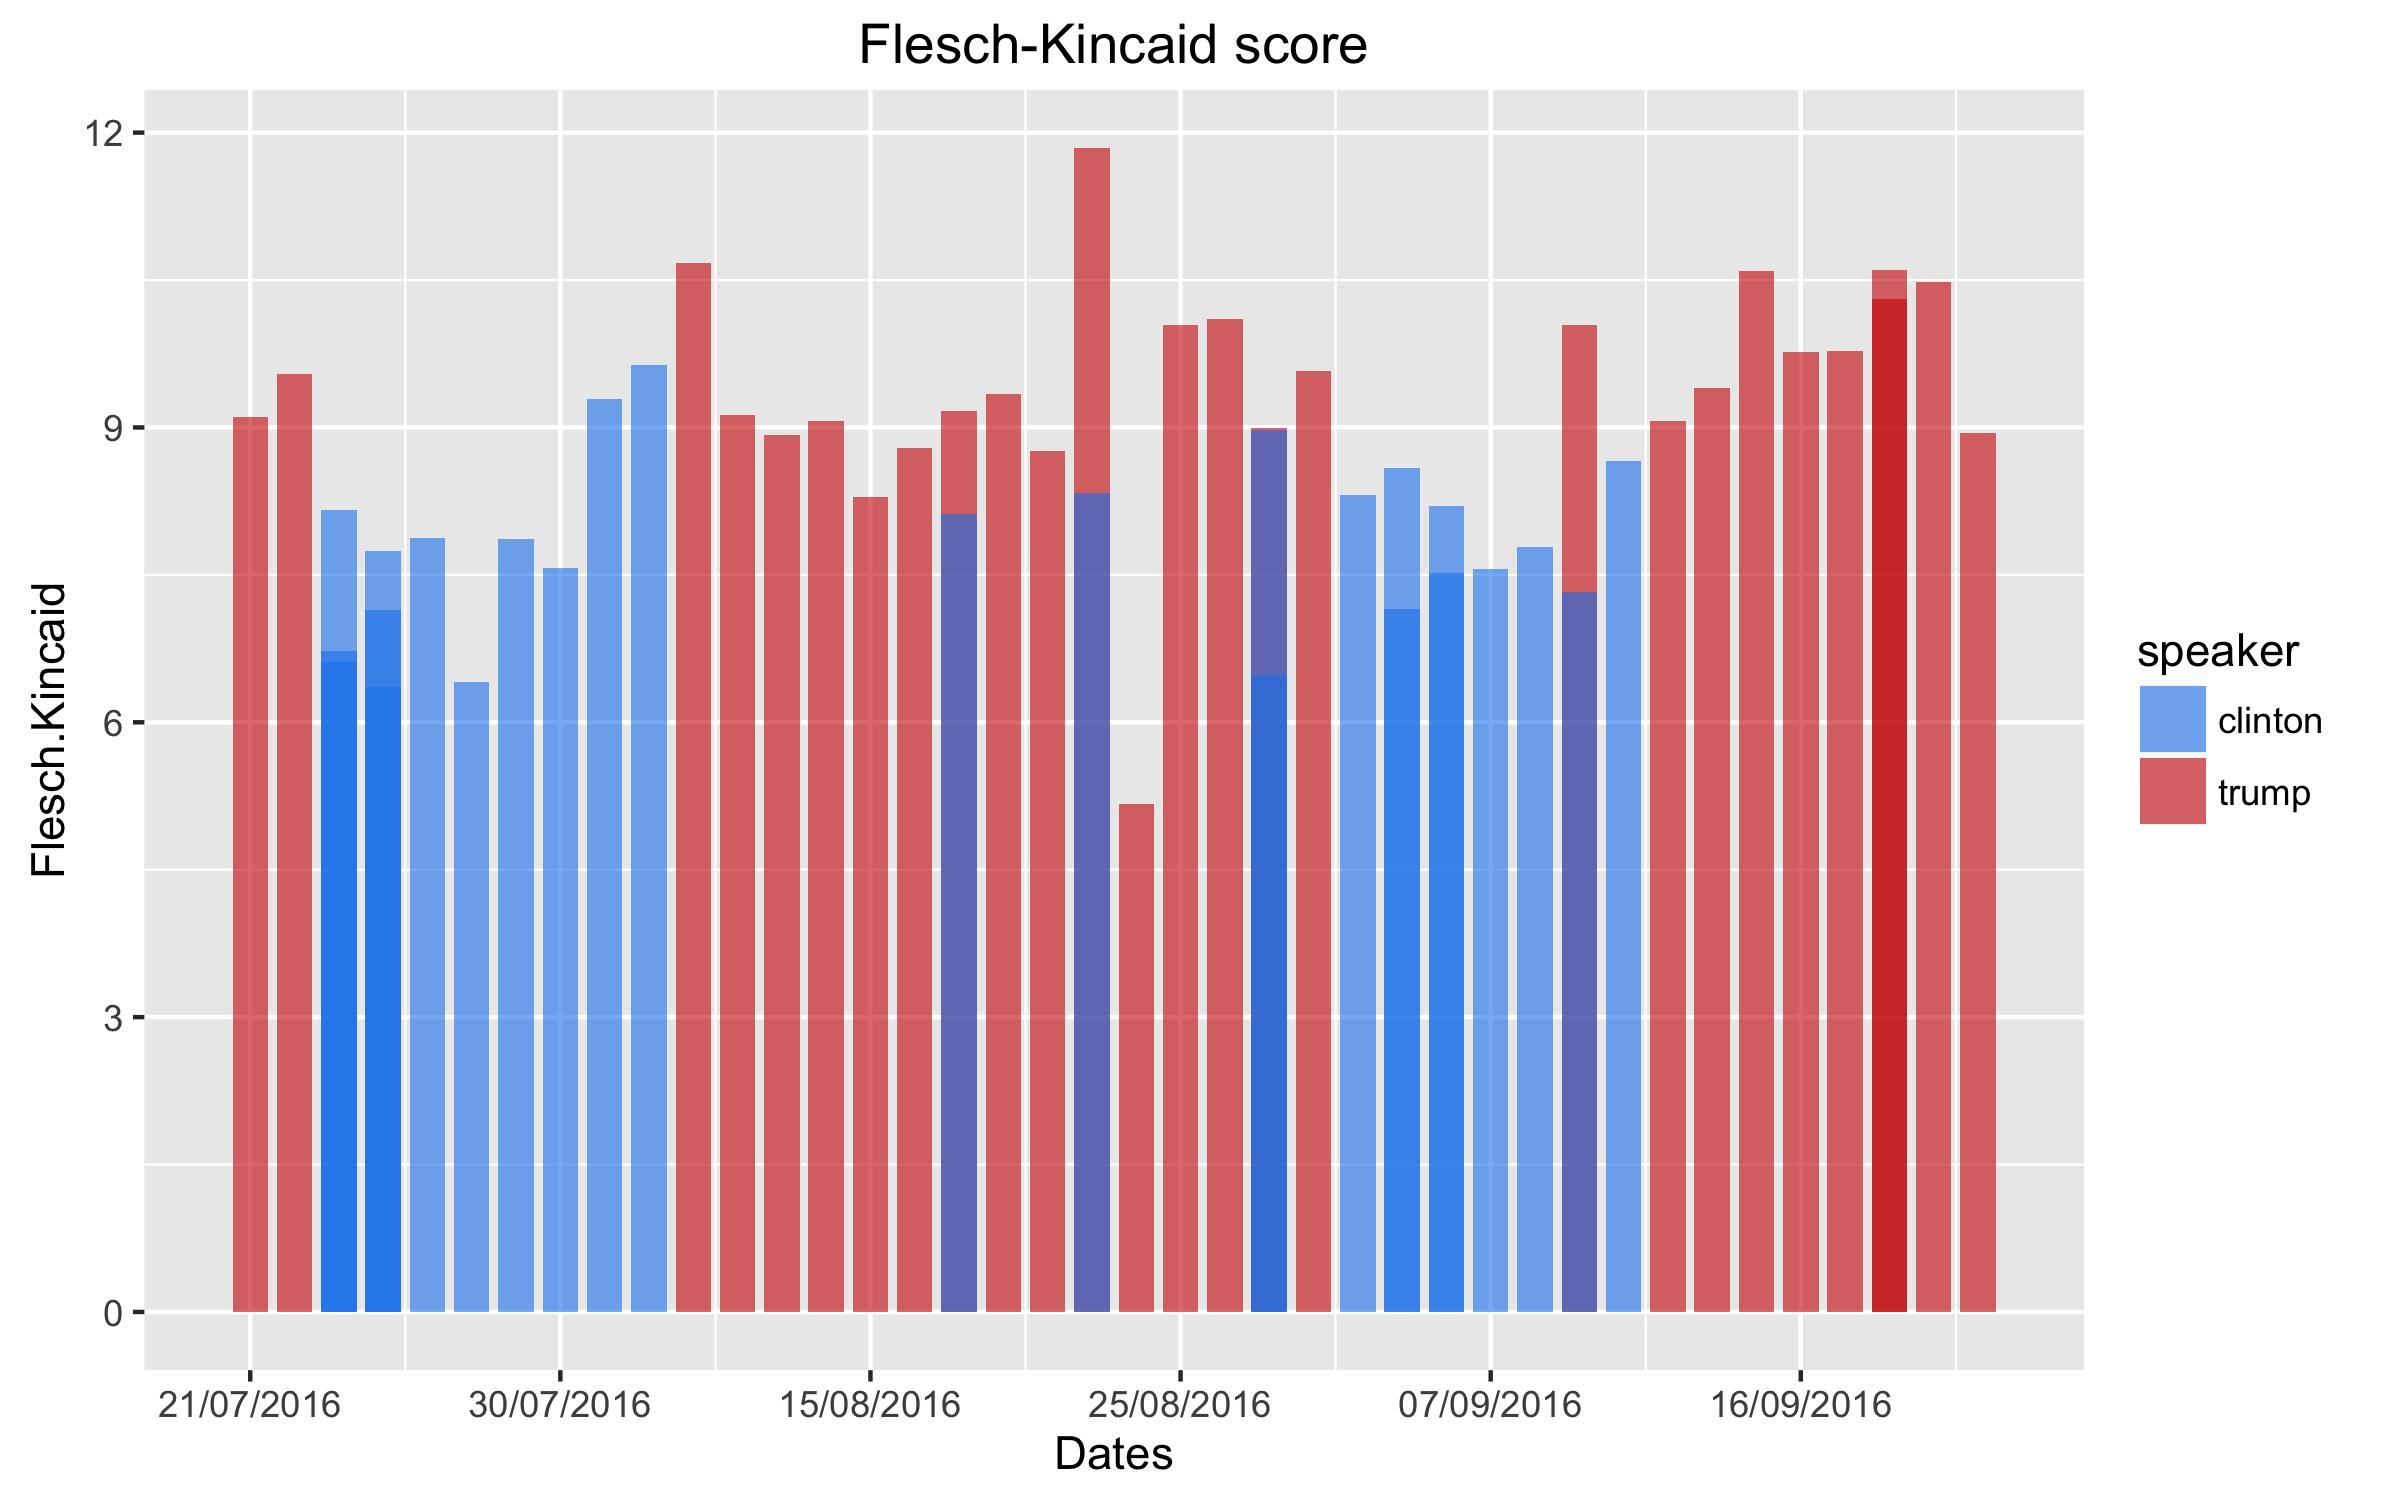 Figure 3 Flesch-Kincaid index score for Clinton and Trump speeches